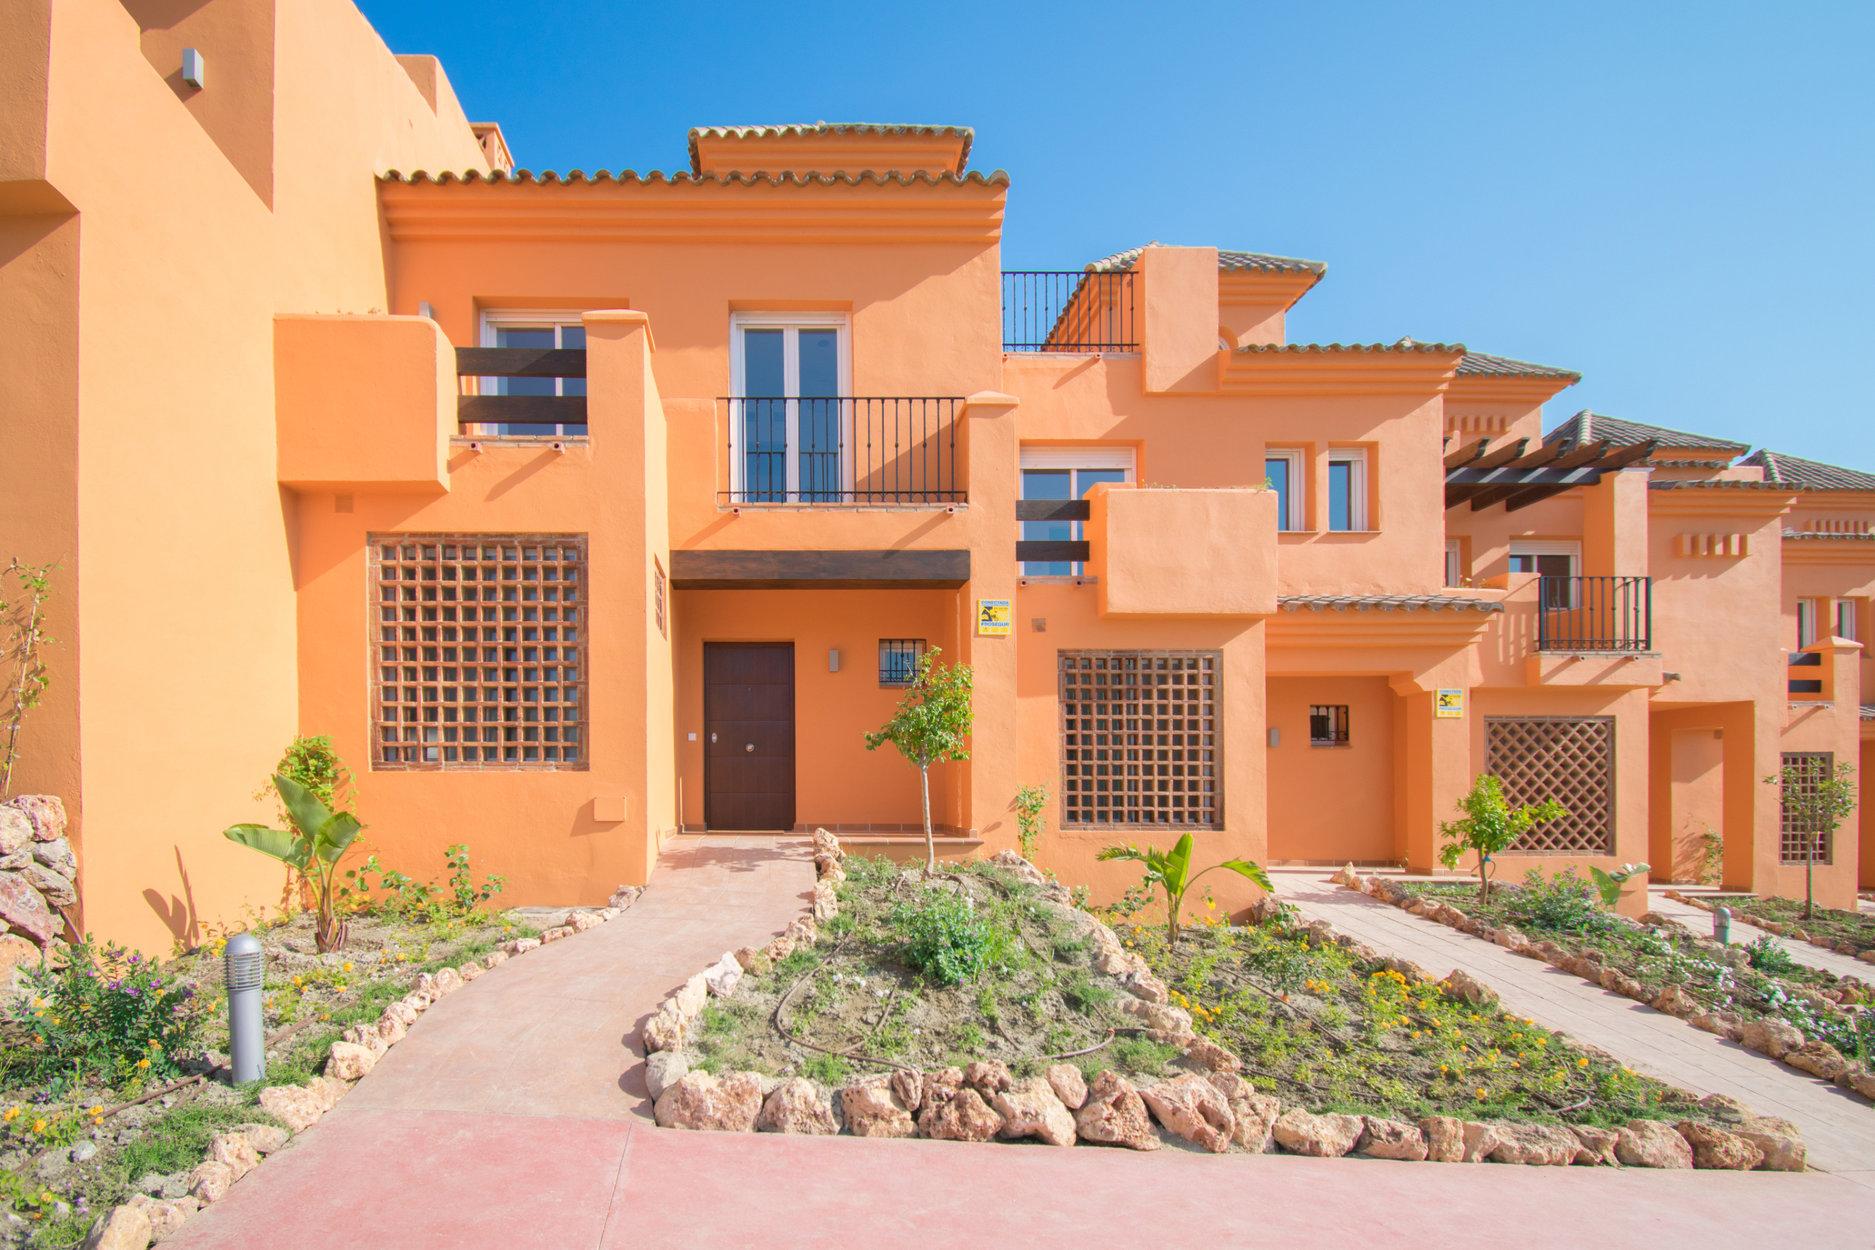 Townhouse For Sale in Paraiso Bellevue, El Paraiso, Estepona